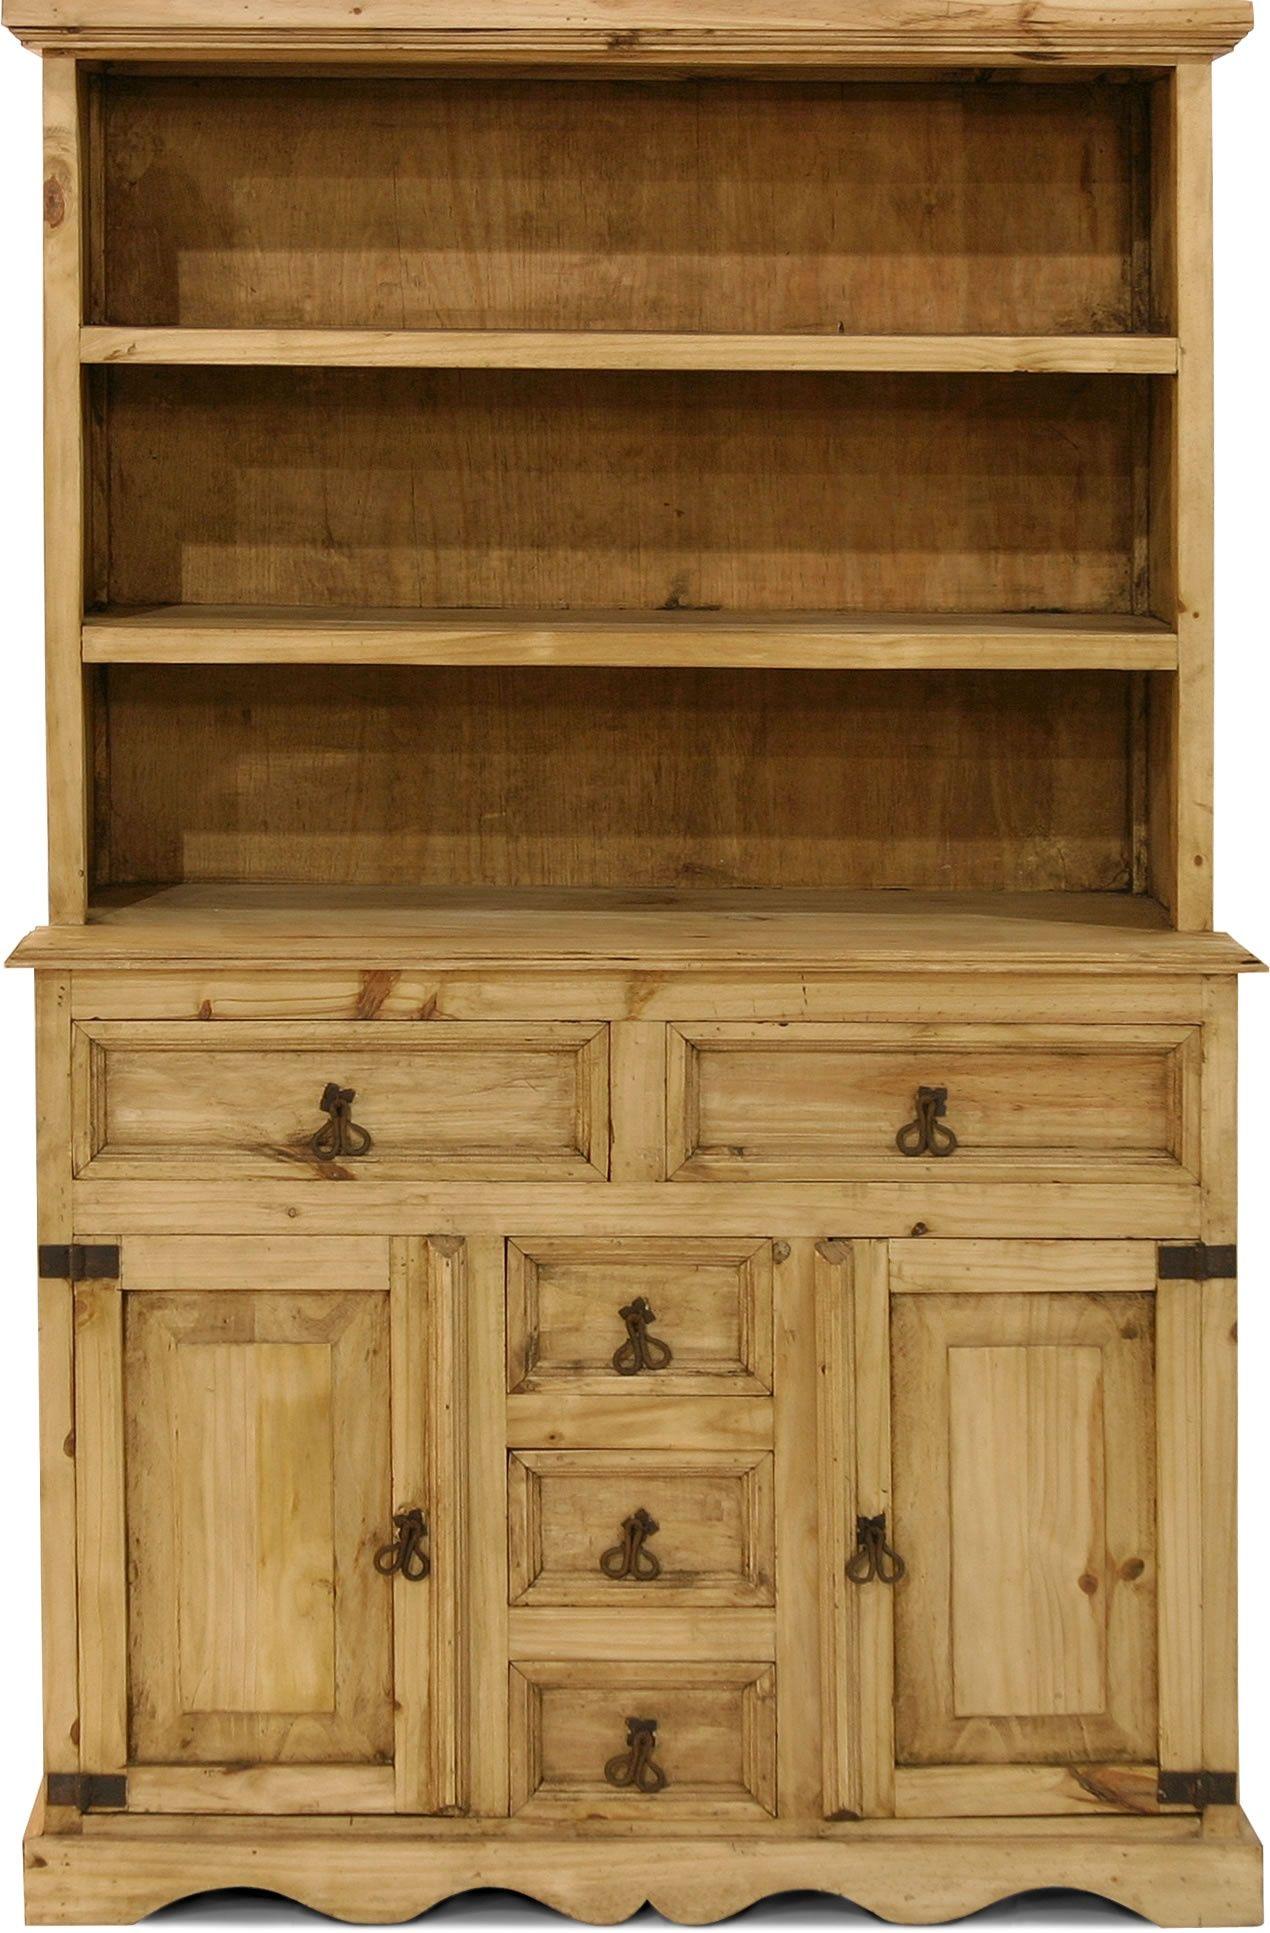 Picture of Gonzalez Rustic Furniture Rustic Look Western Pine ...